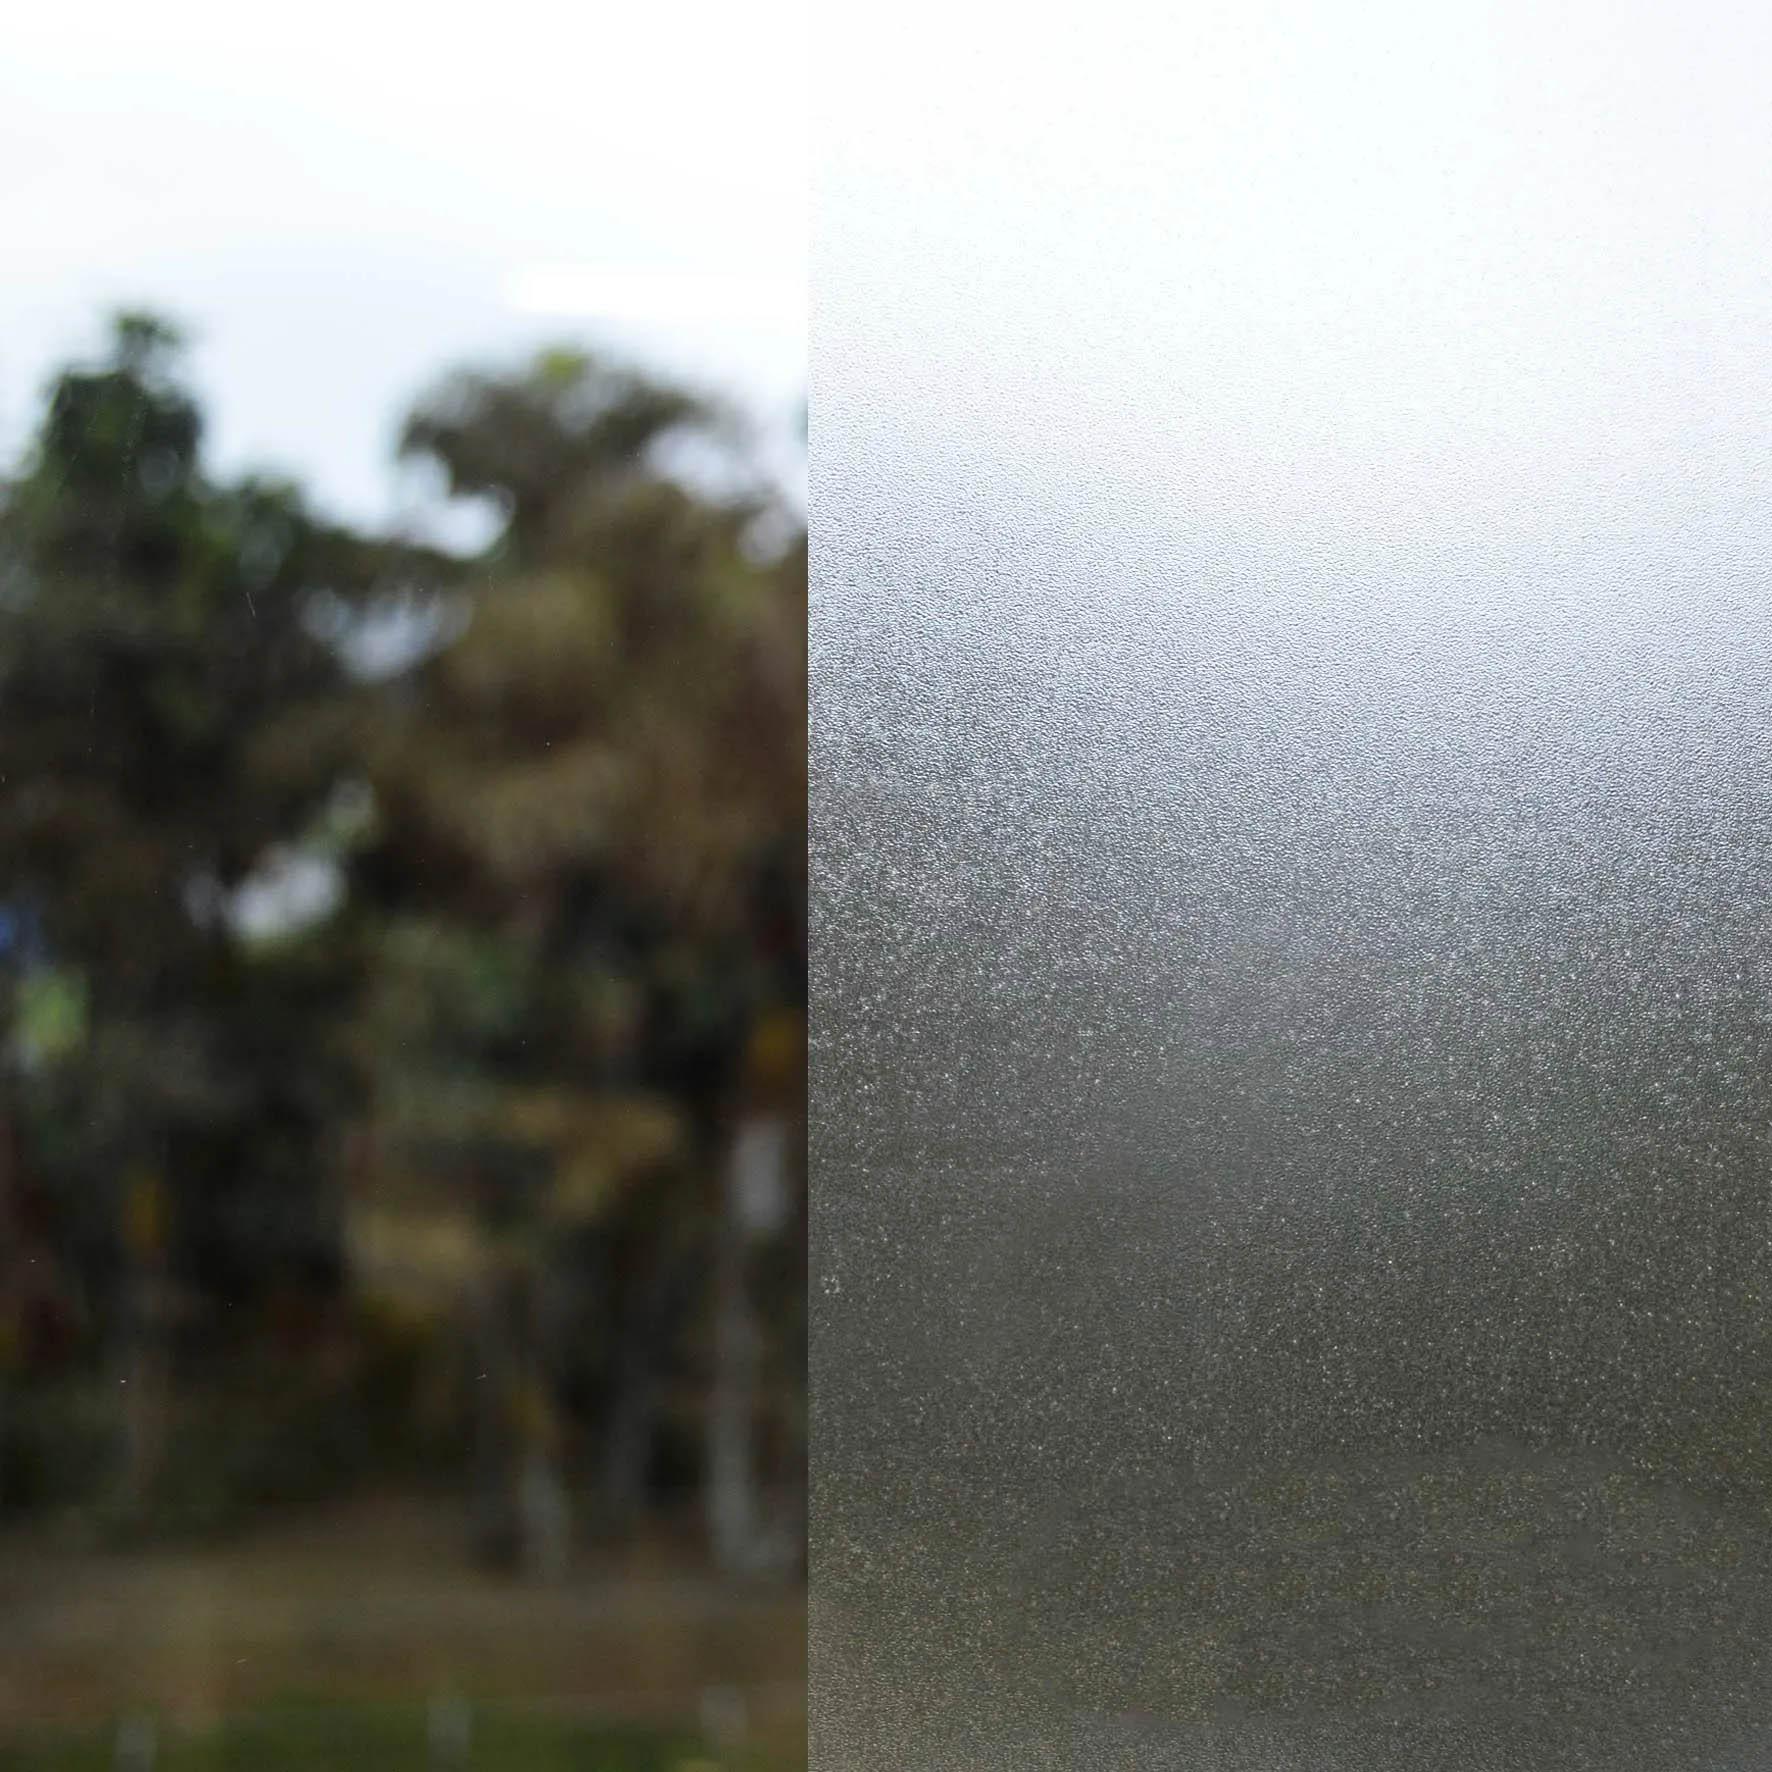 Adesivo Jateado para Vidro Transparente Metalizado 1,22m x 1,00m